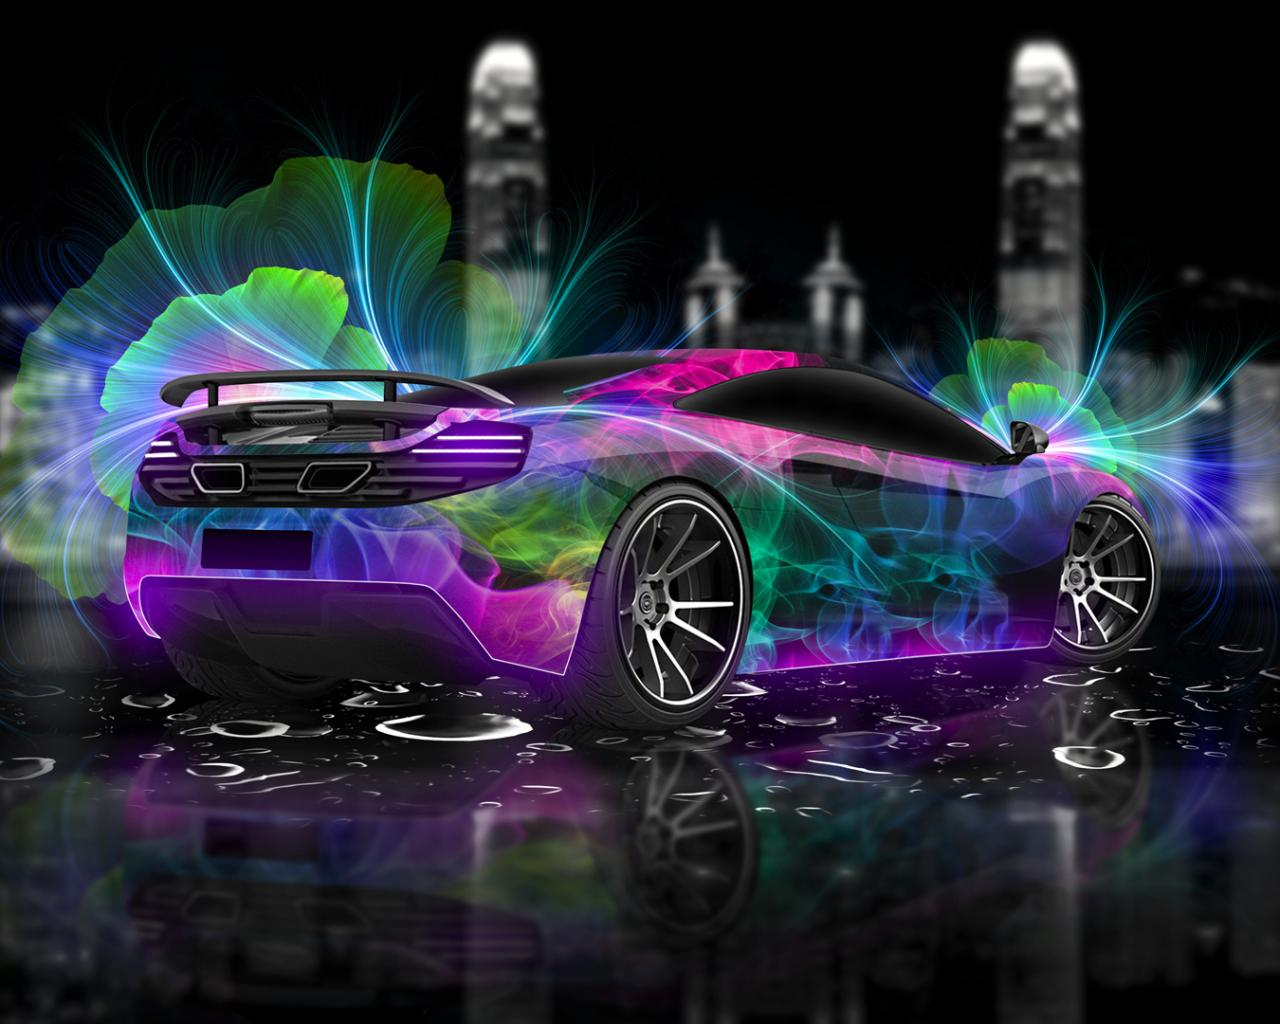 2015 2016 coolest cars exotic cars sport cars car wallpaper